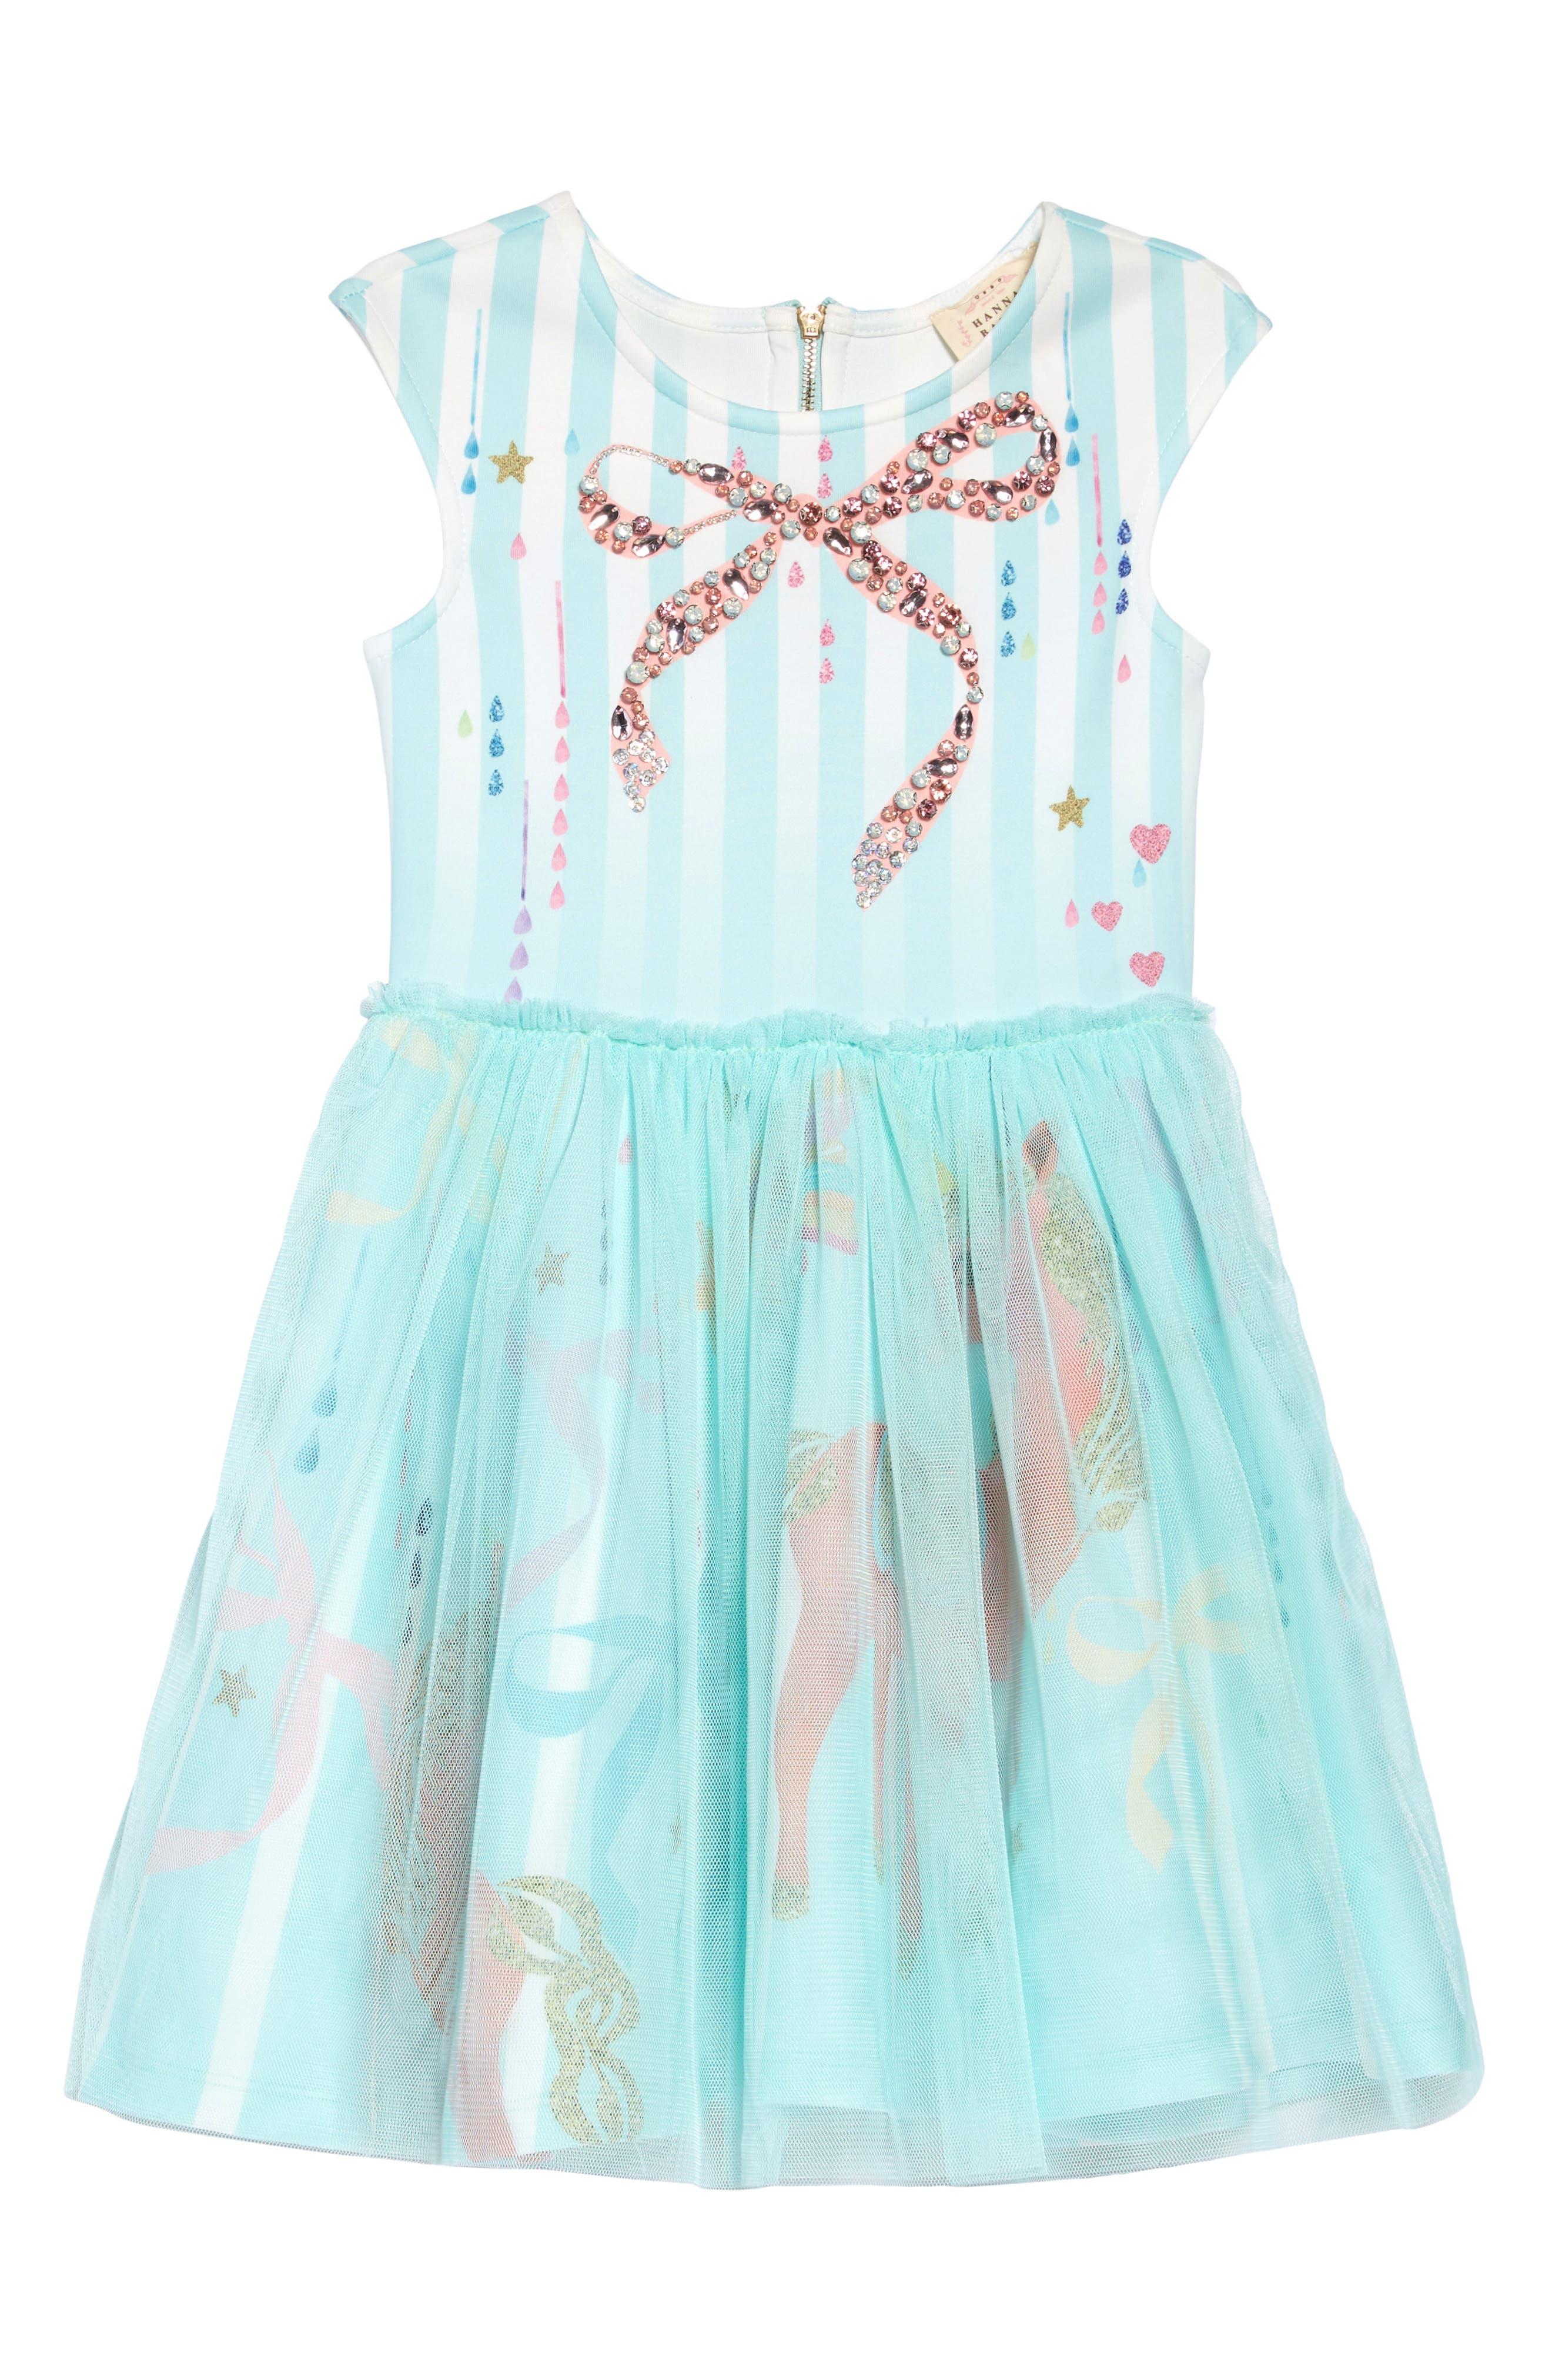 HANNAH BANANA Bow & Unicorn Fit & Flare Tulle Dress, Main, color, MINT MULTI